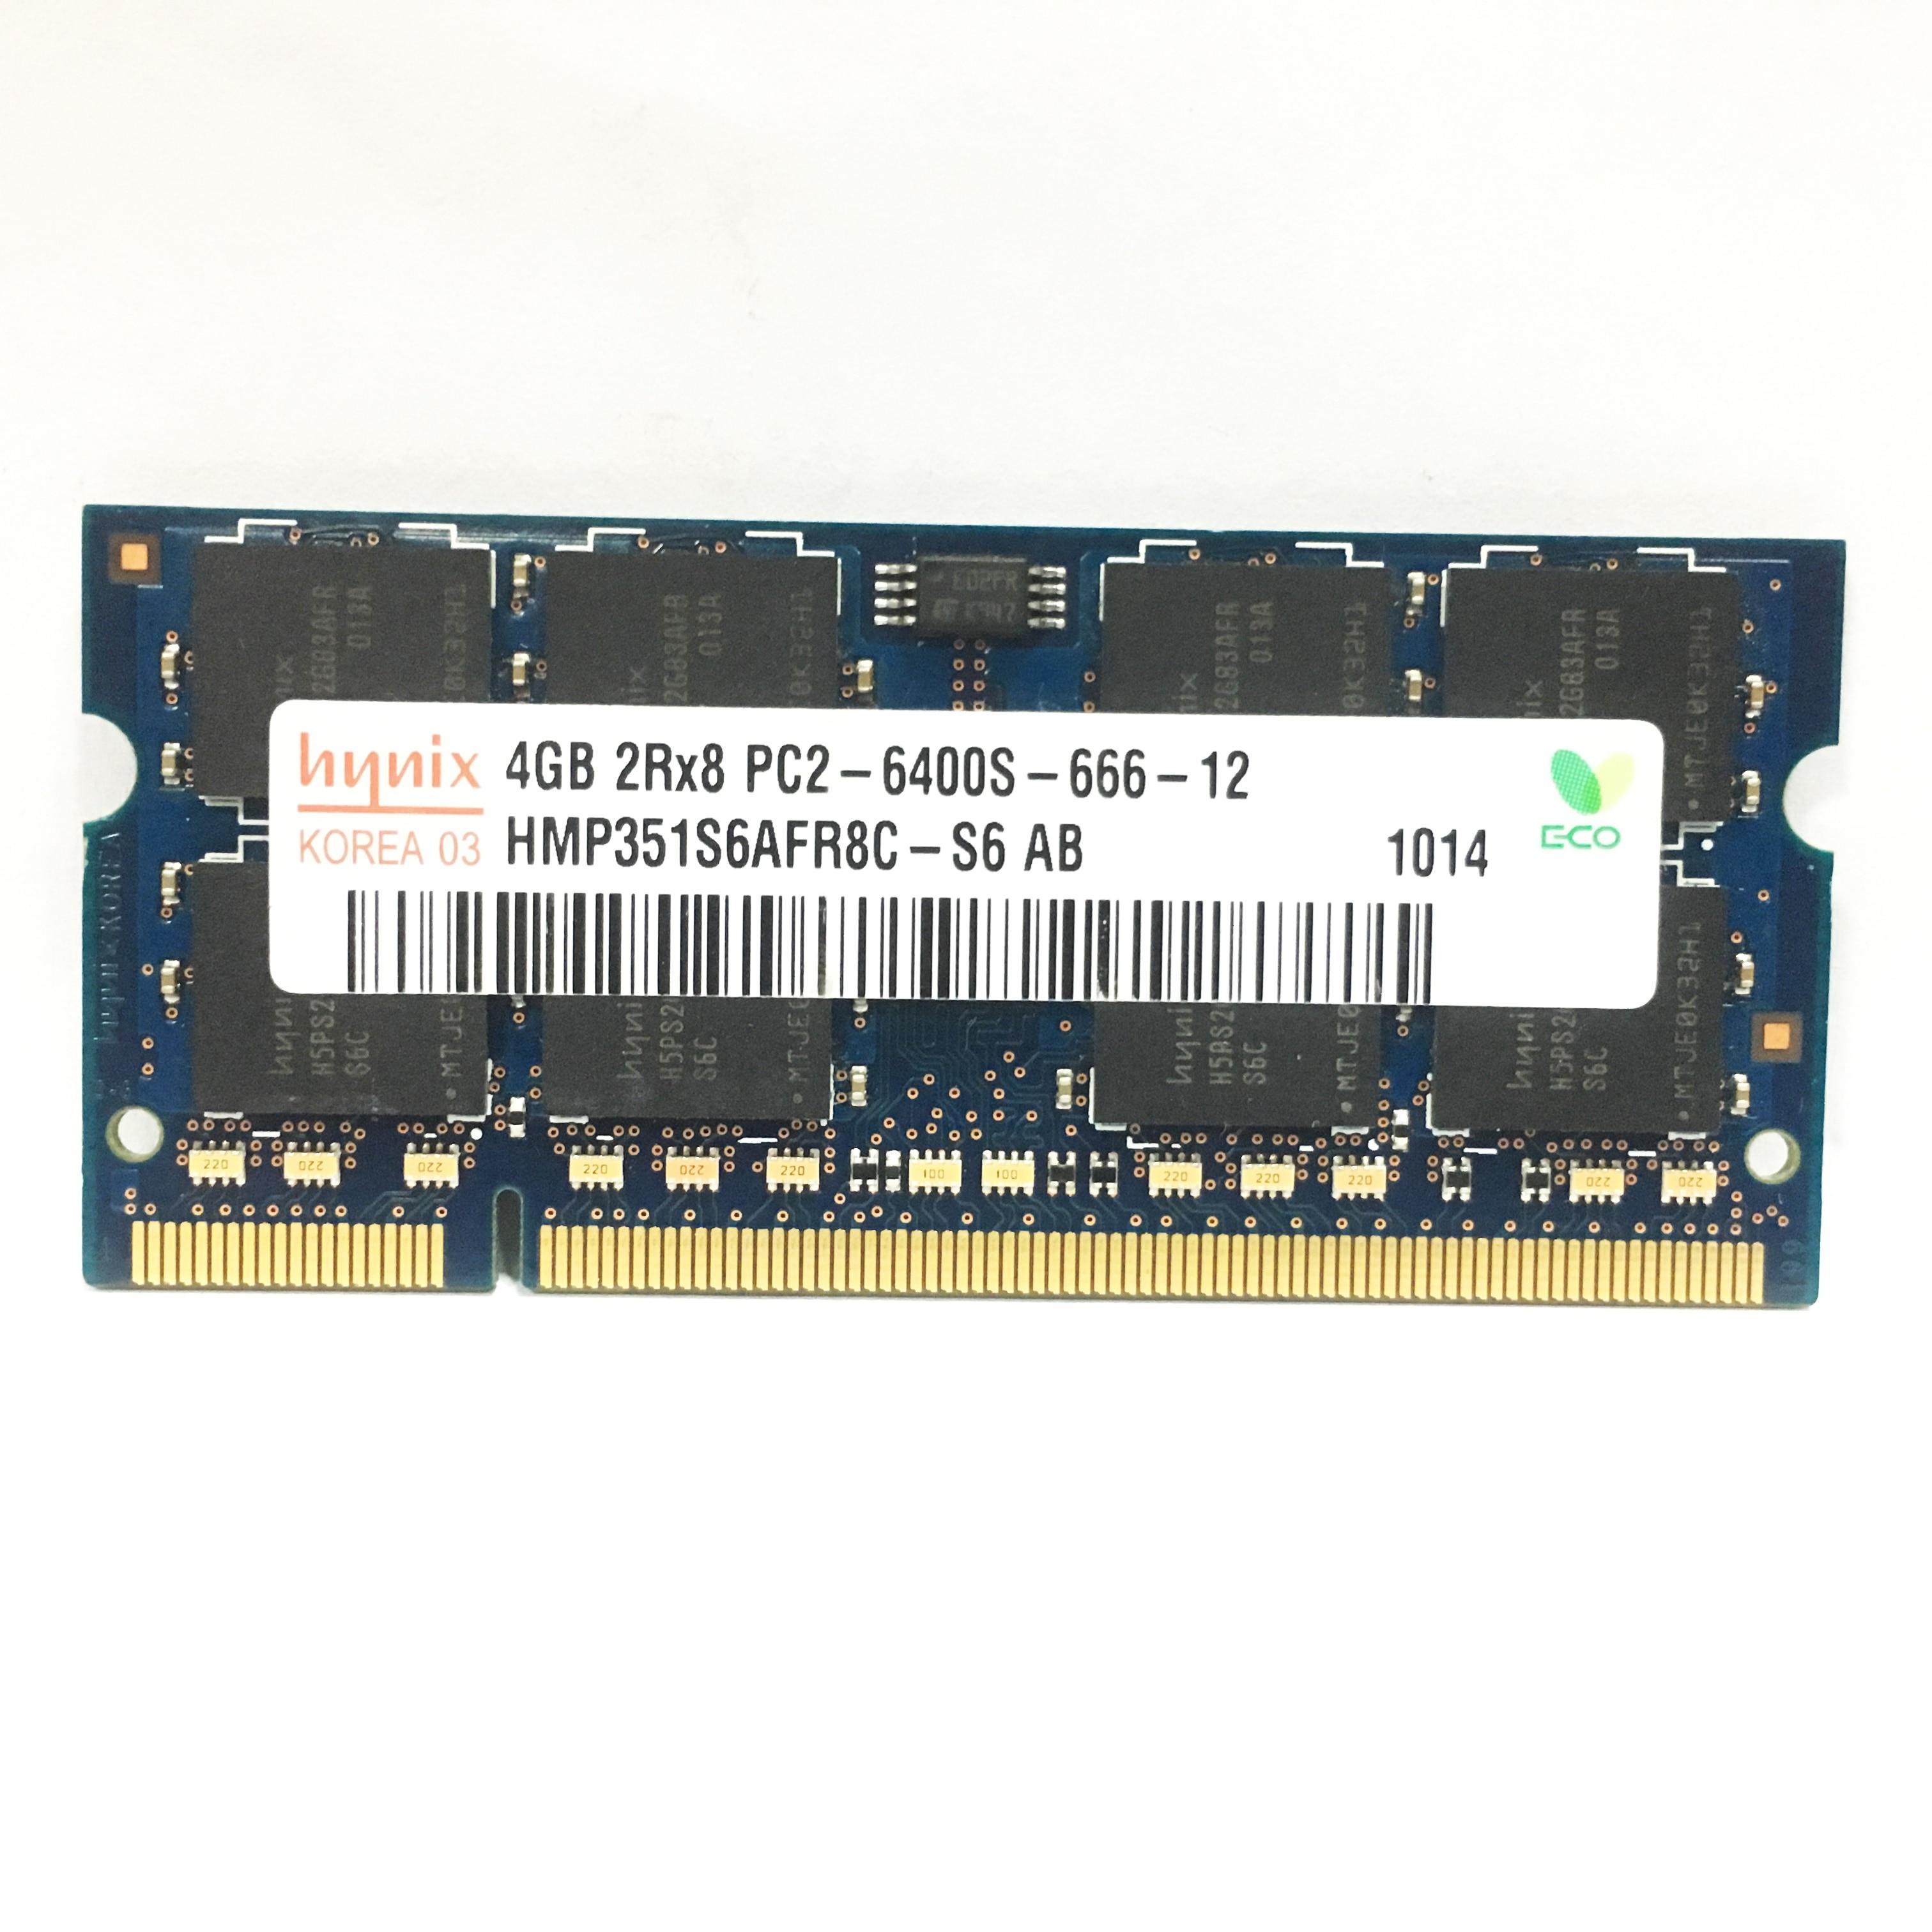 1G 1G  2G 4GB 2GB PC2 6400 5300  DDR2 667MHz 800MHz Laptop RAM notebook  memory RAM Use original /hynix chipset 6